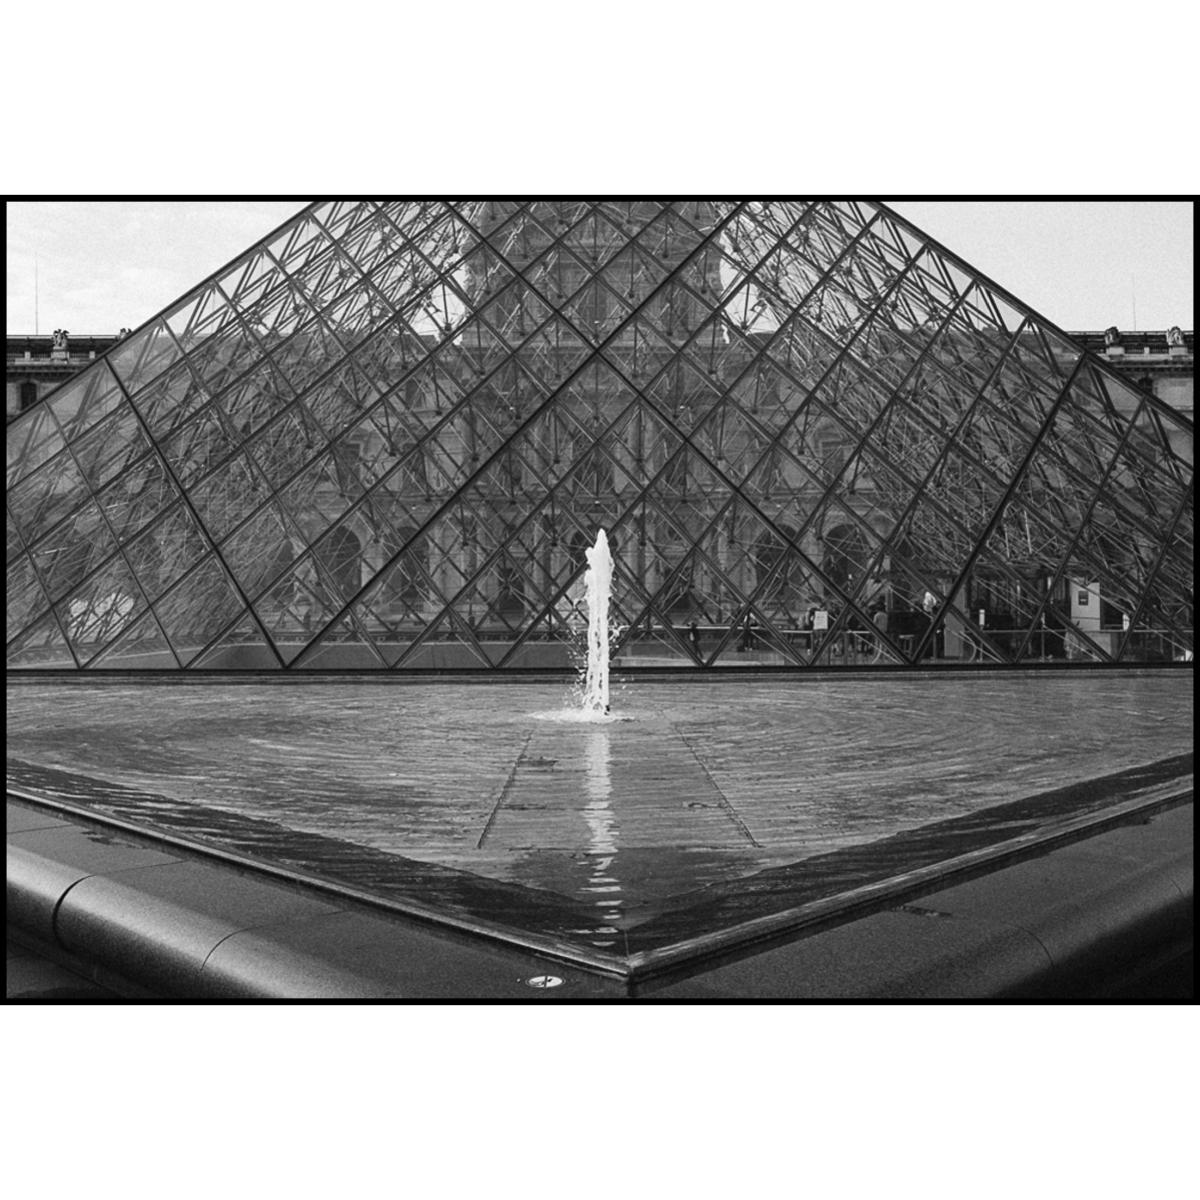 paris file-114.jpg